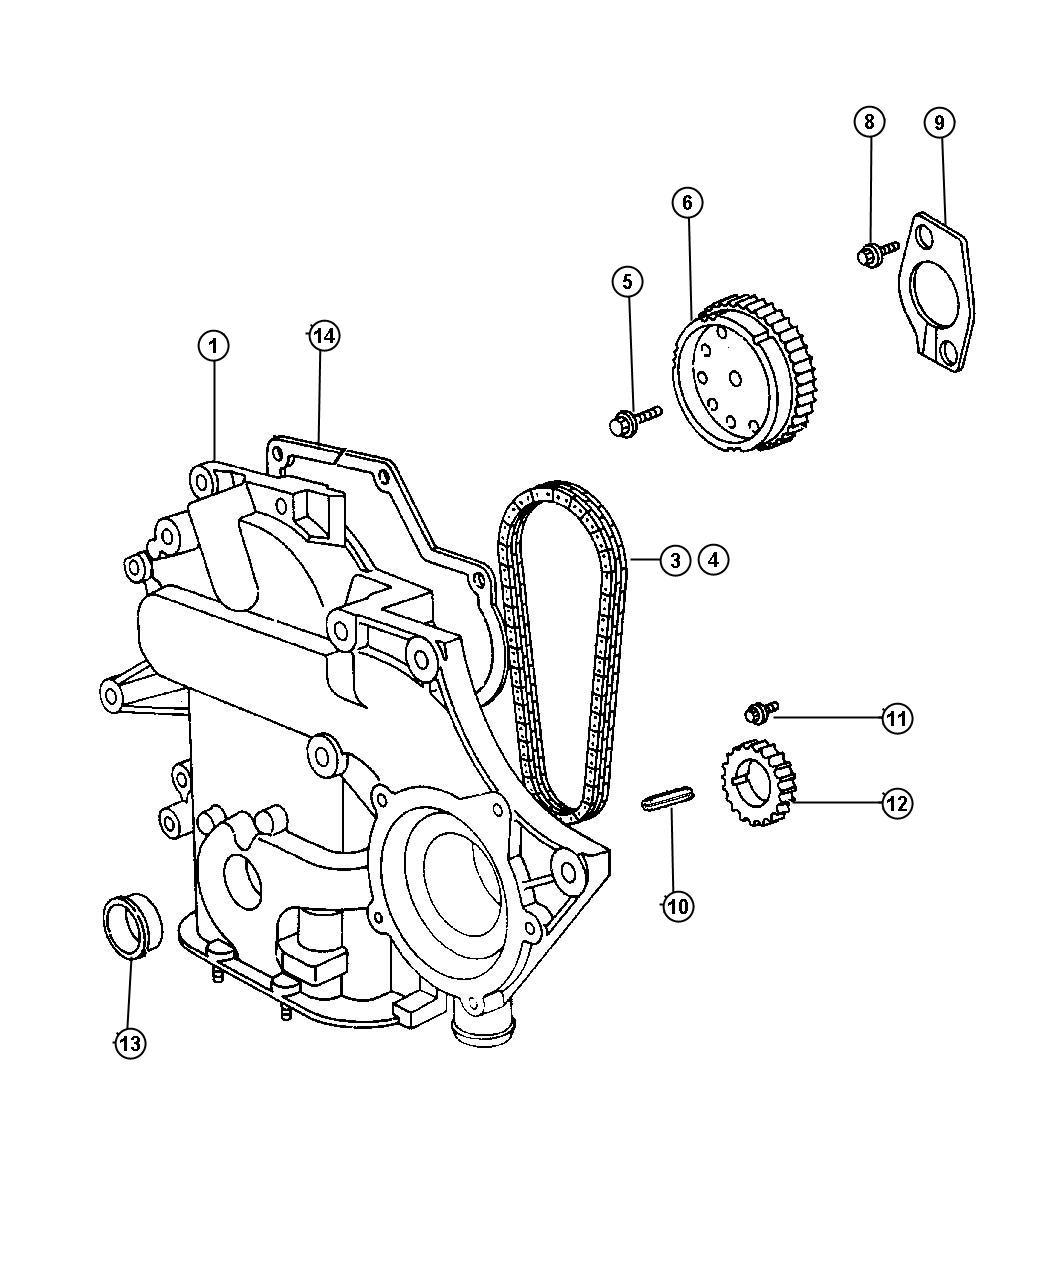 Dodge Grand Caravan Timing Chain And Cover 3 8l 3 8l